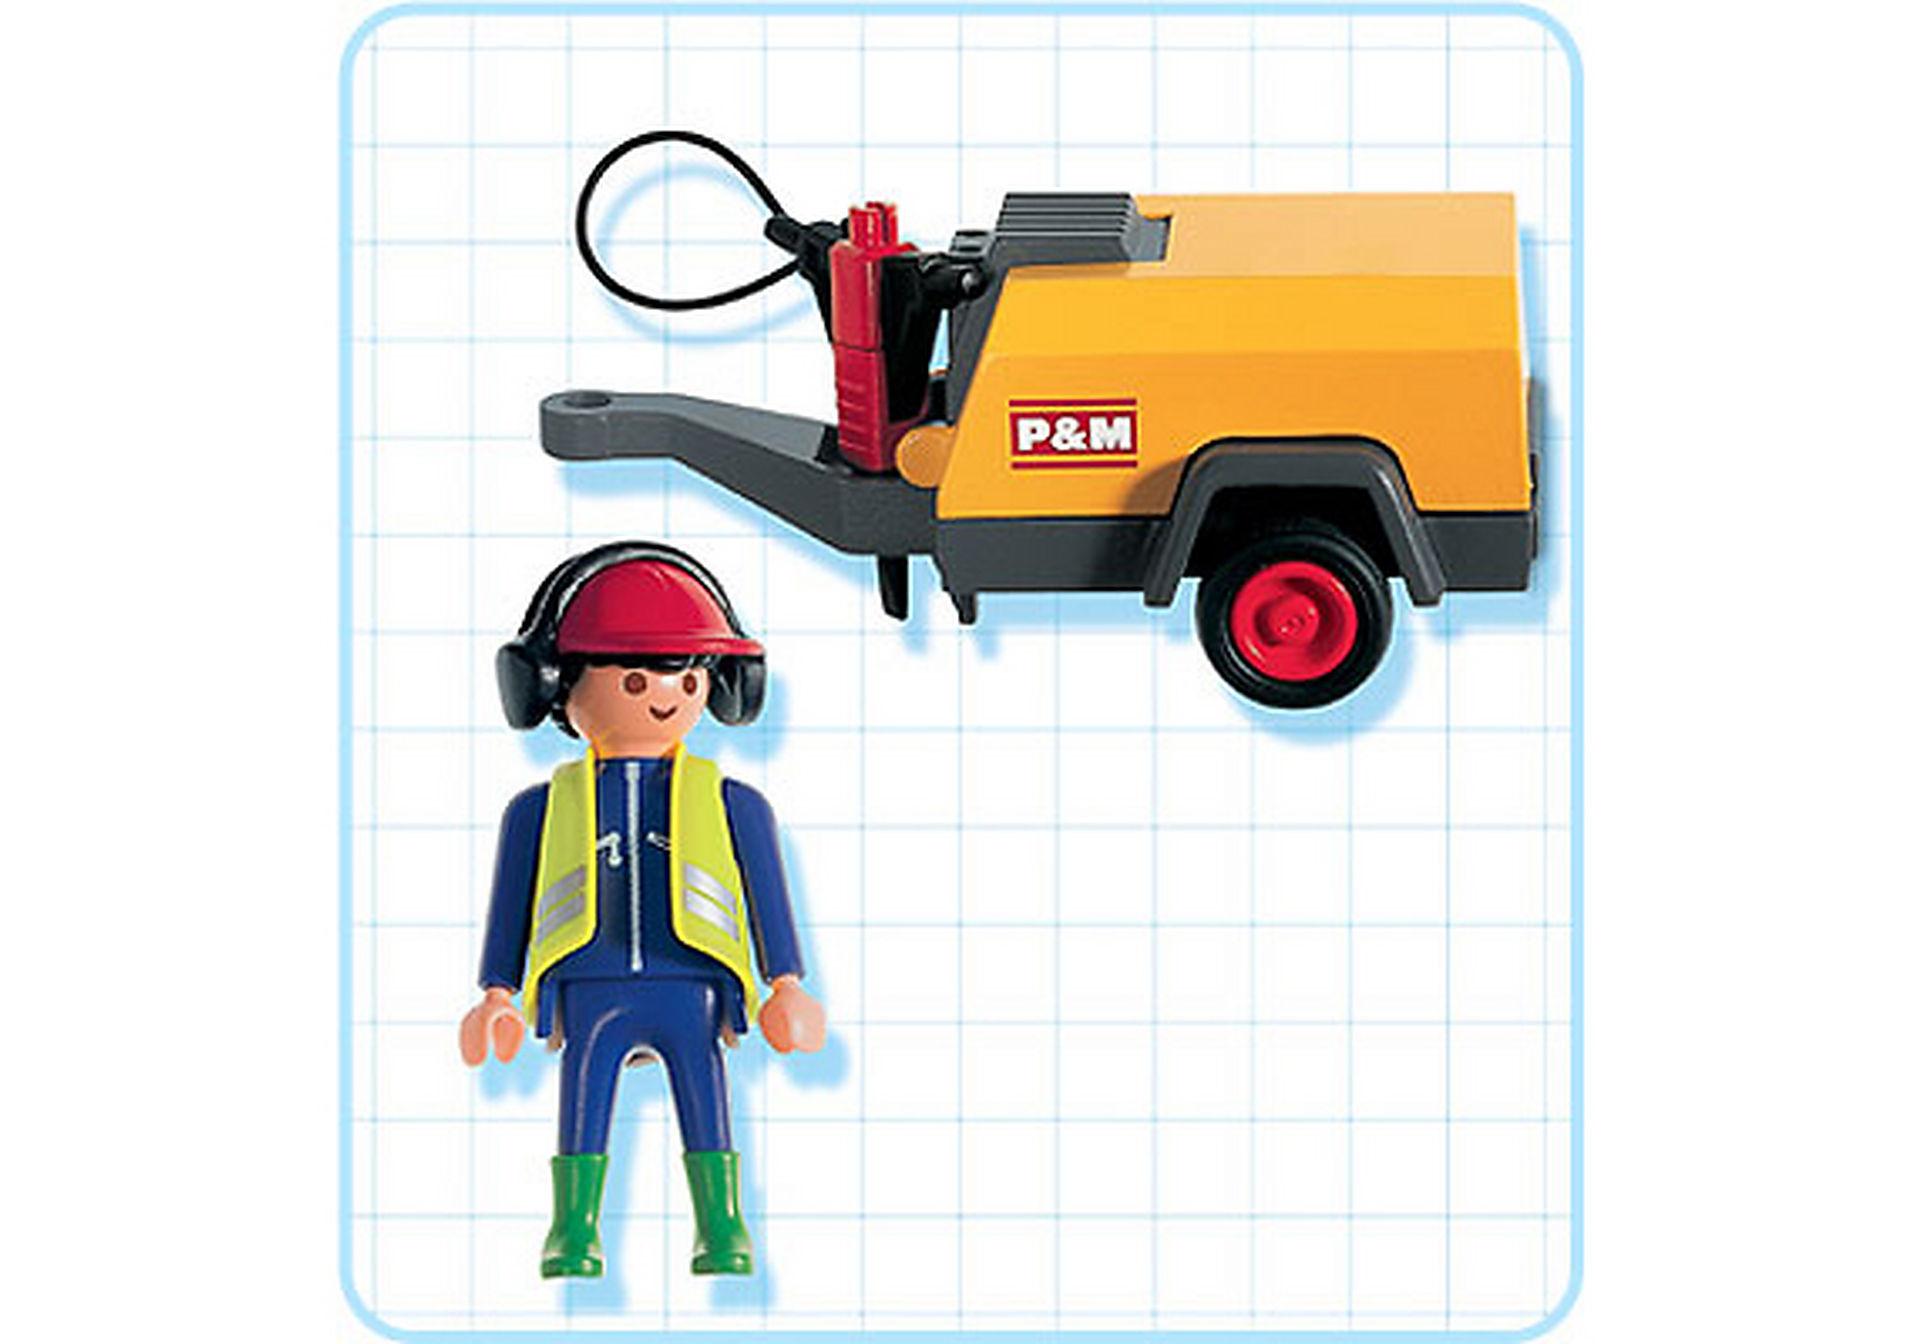 3270-C Bauarbeiter/Kompressor zoom image2